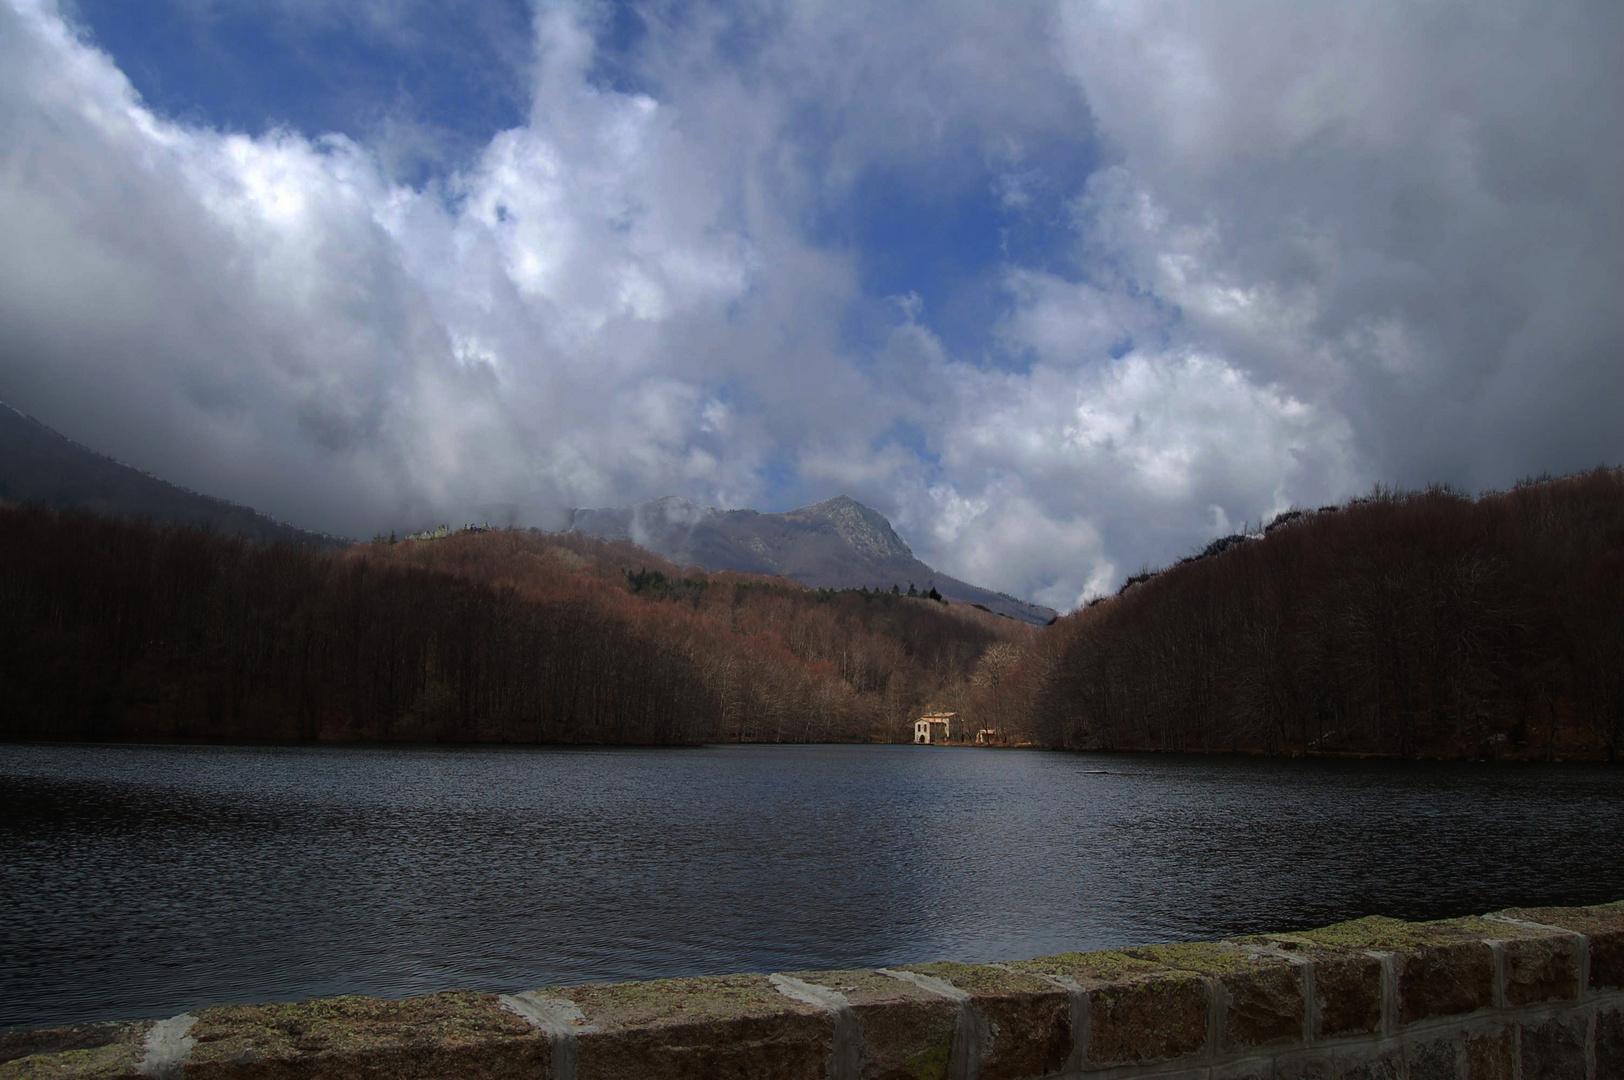 Pantano de Santa Fe del Montseny